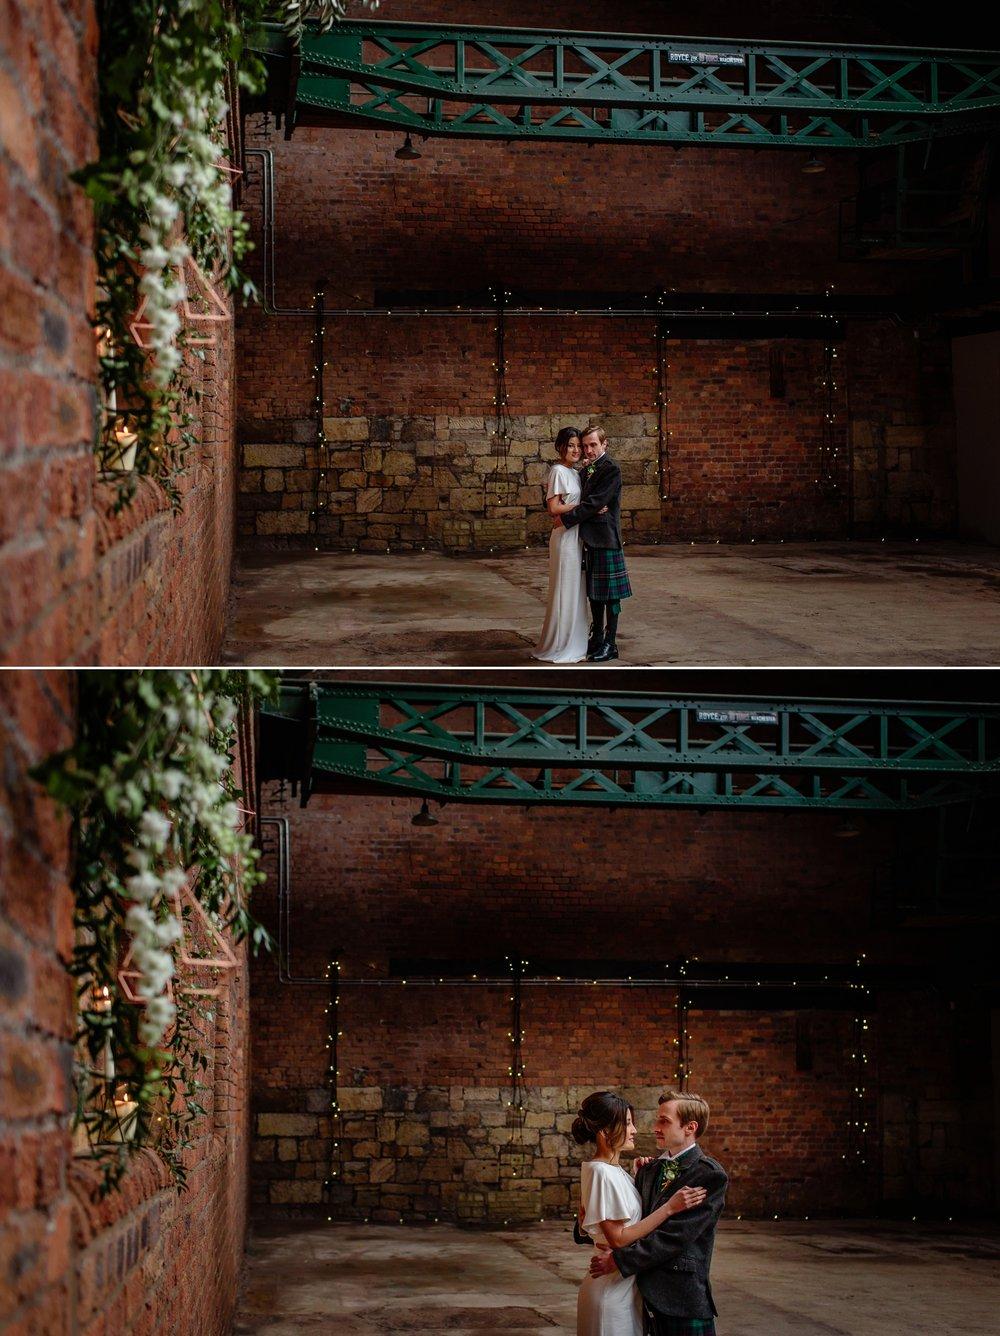 engine-works-wedding-styled-shoot-fotomaki-photography-117.jpg